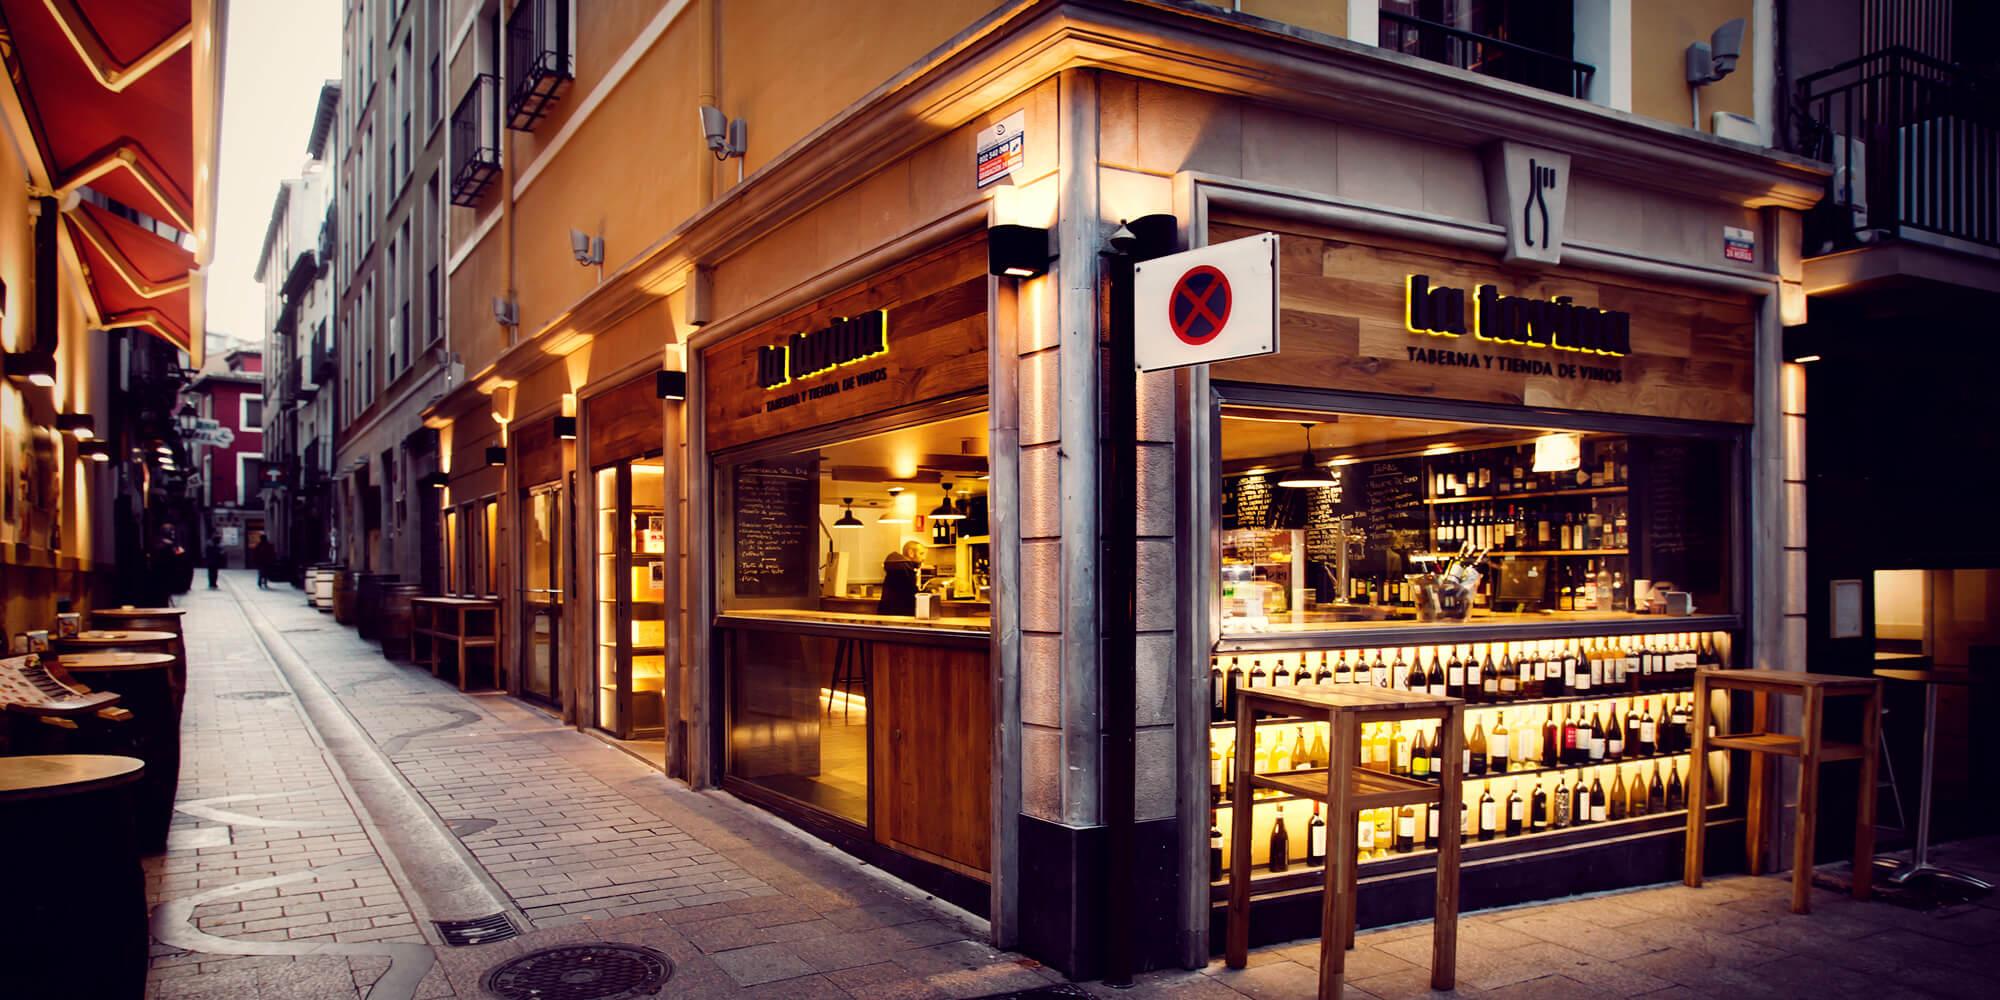 Bilbao Rioja Gastronomy